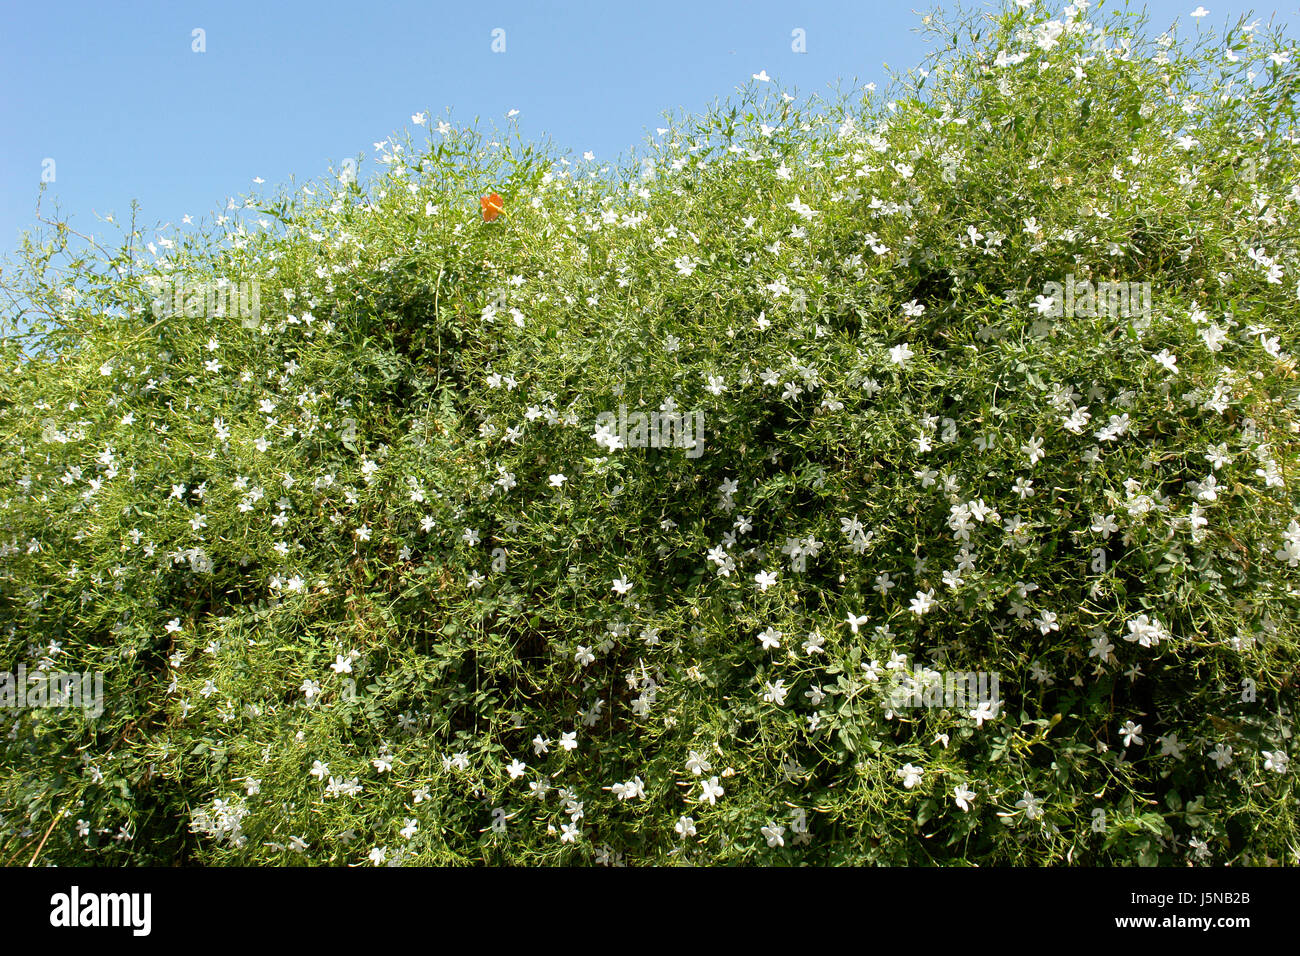 jasminum grandiflorum stock photos jasminum grandiflorum. Black Bedroom Furniture Sets. Home Design Ideas